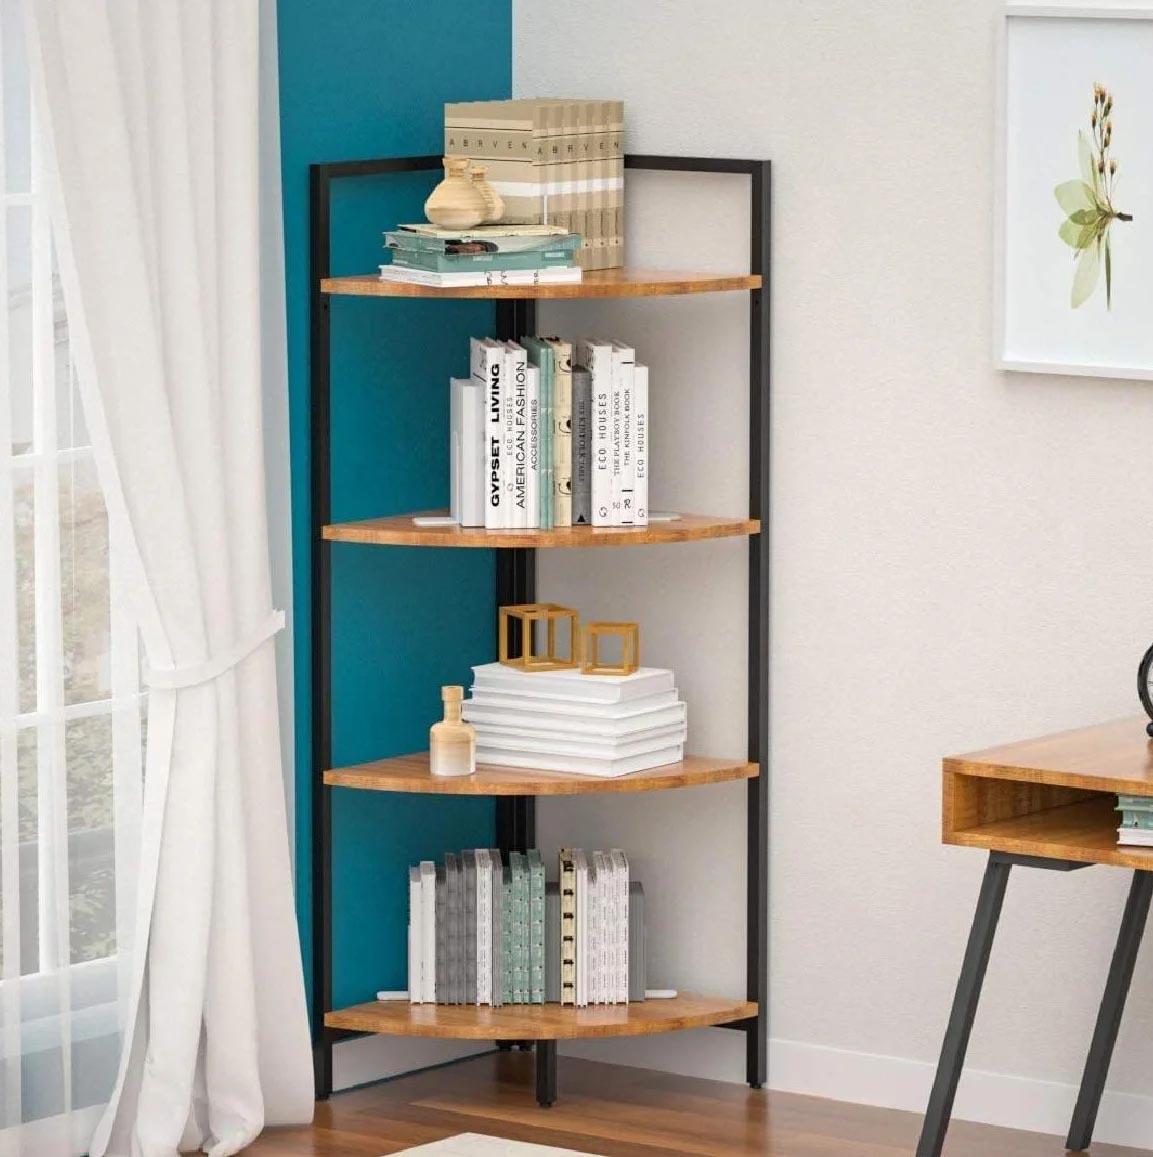 Corner Shelf Ideas - A modern corner shelf with black frame and wood shelves.